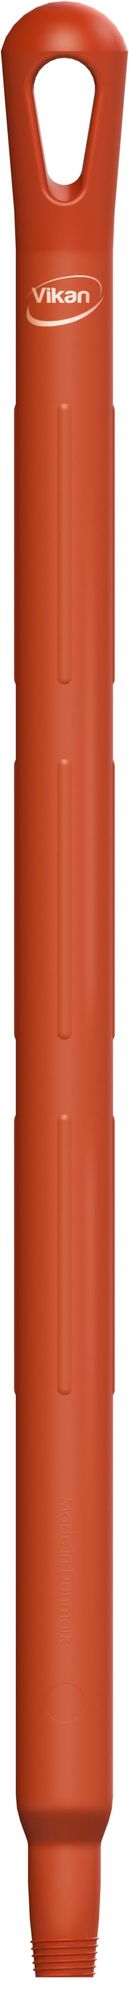 Vikan Hygiene korte steel 65cm -   29664